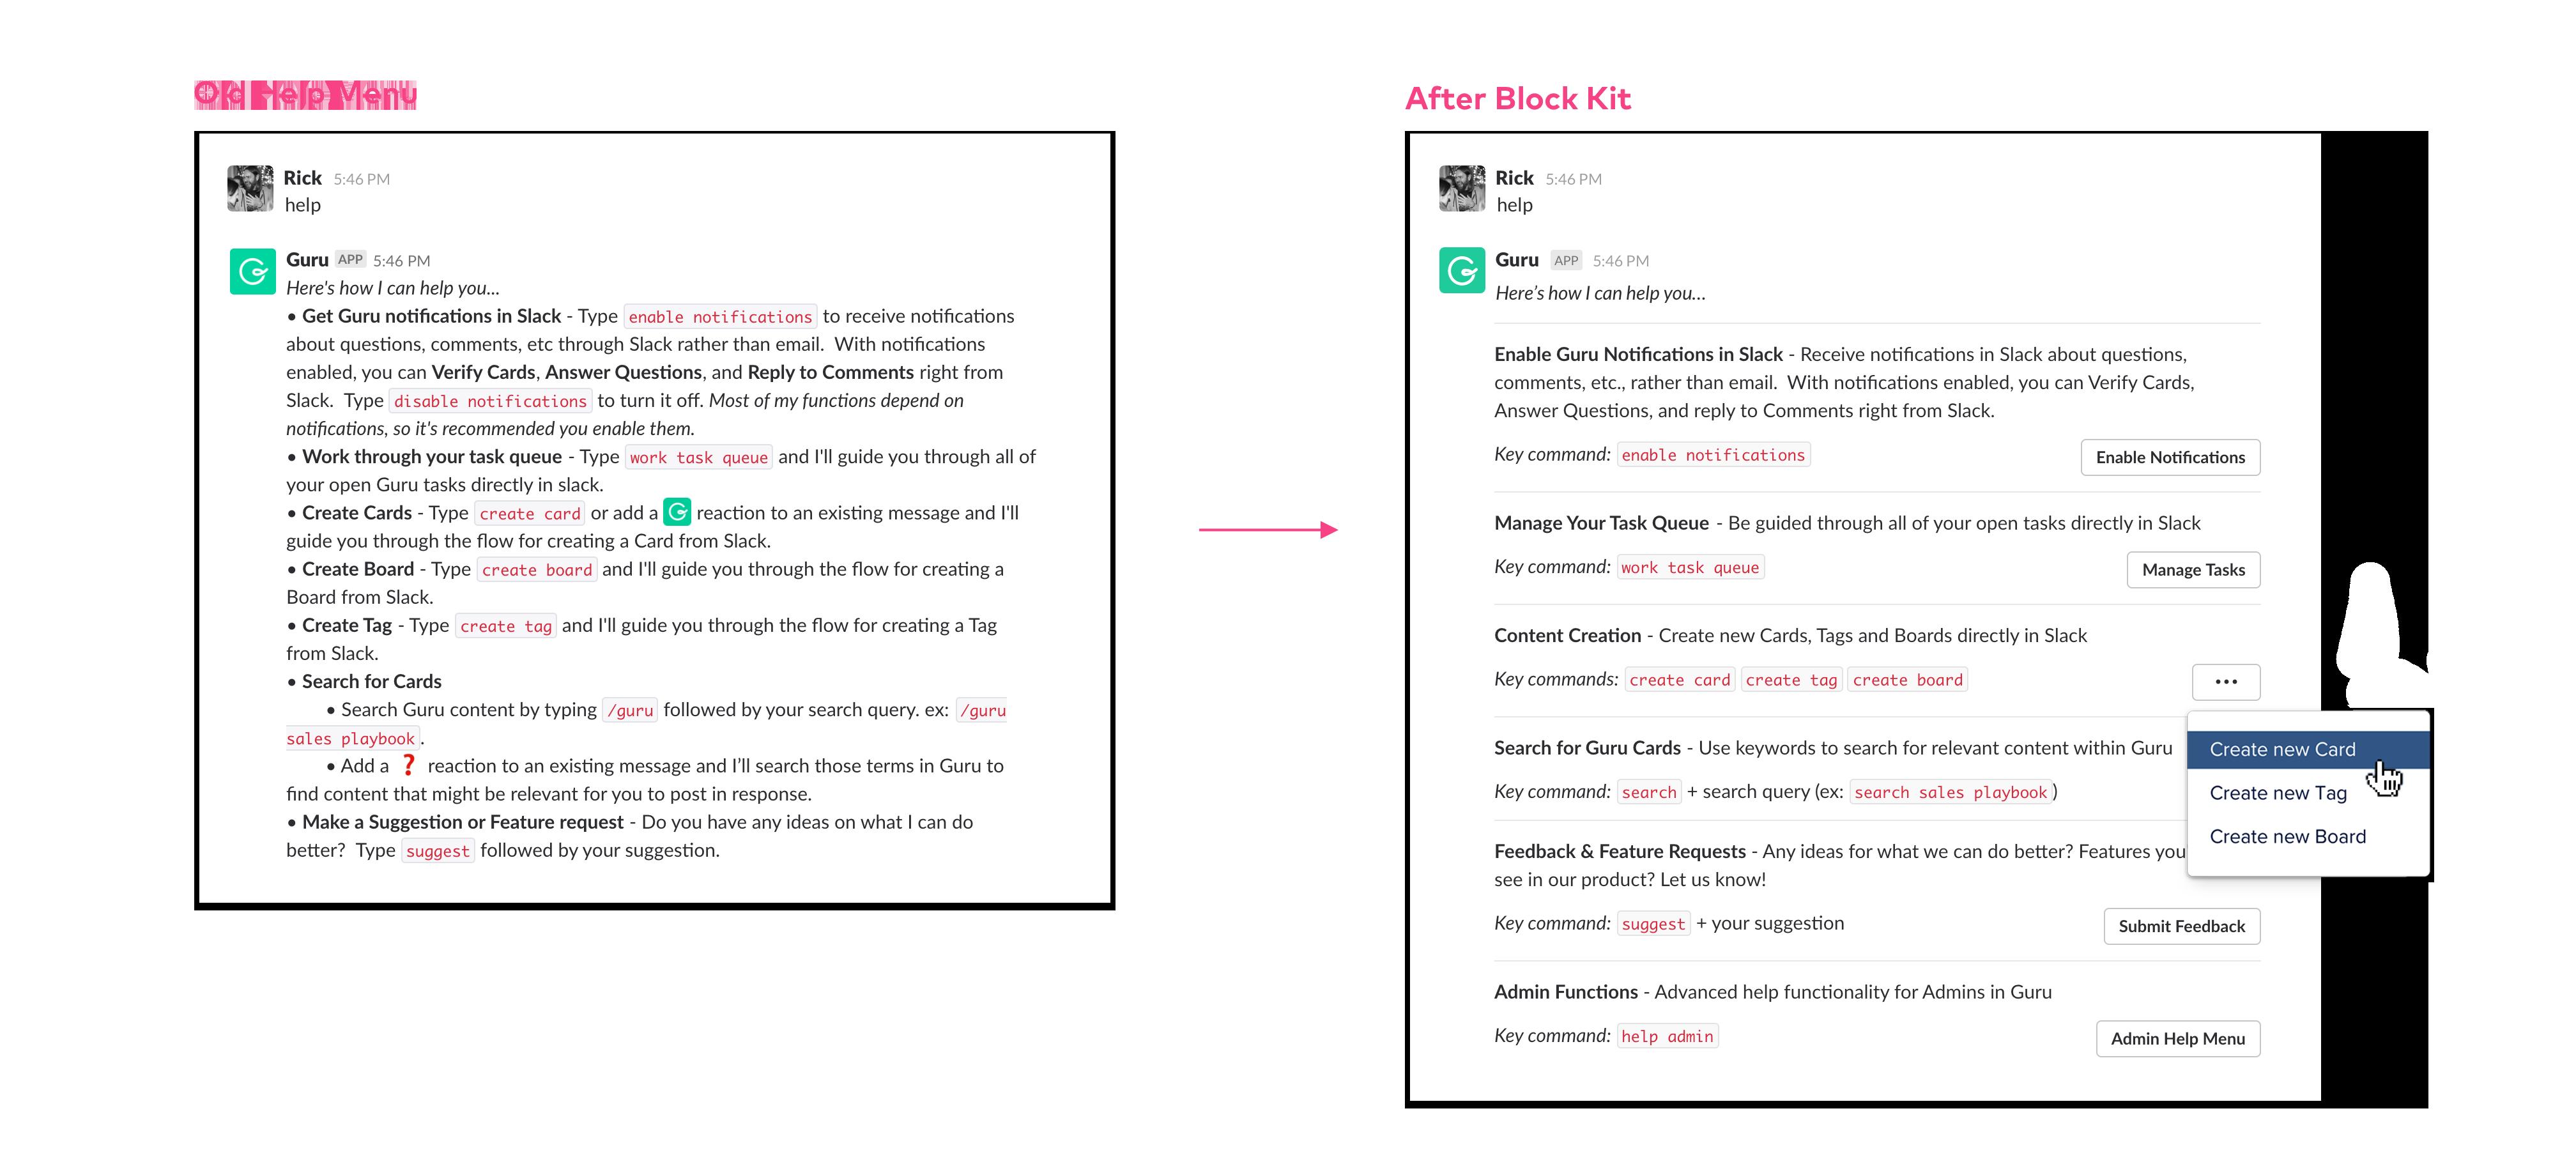 The Guru Slack bot before and after using the Slack Block Kit